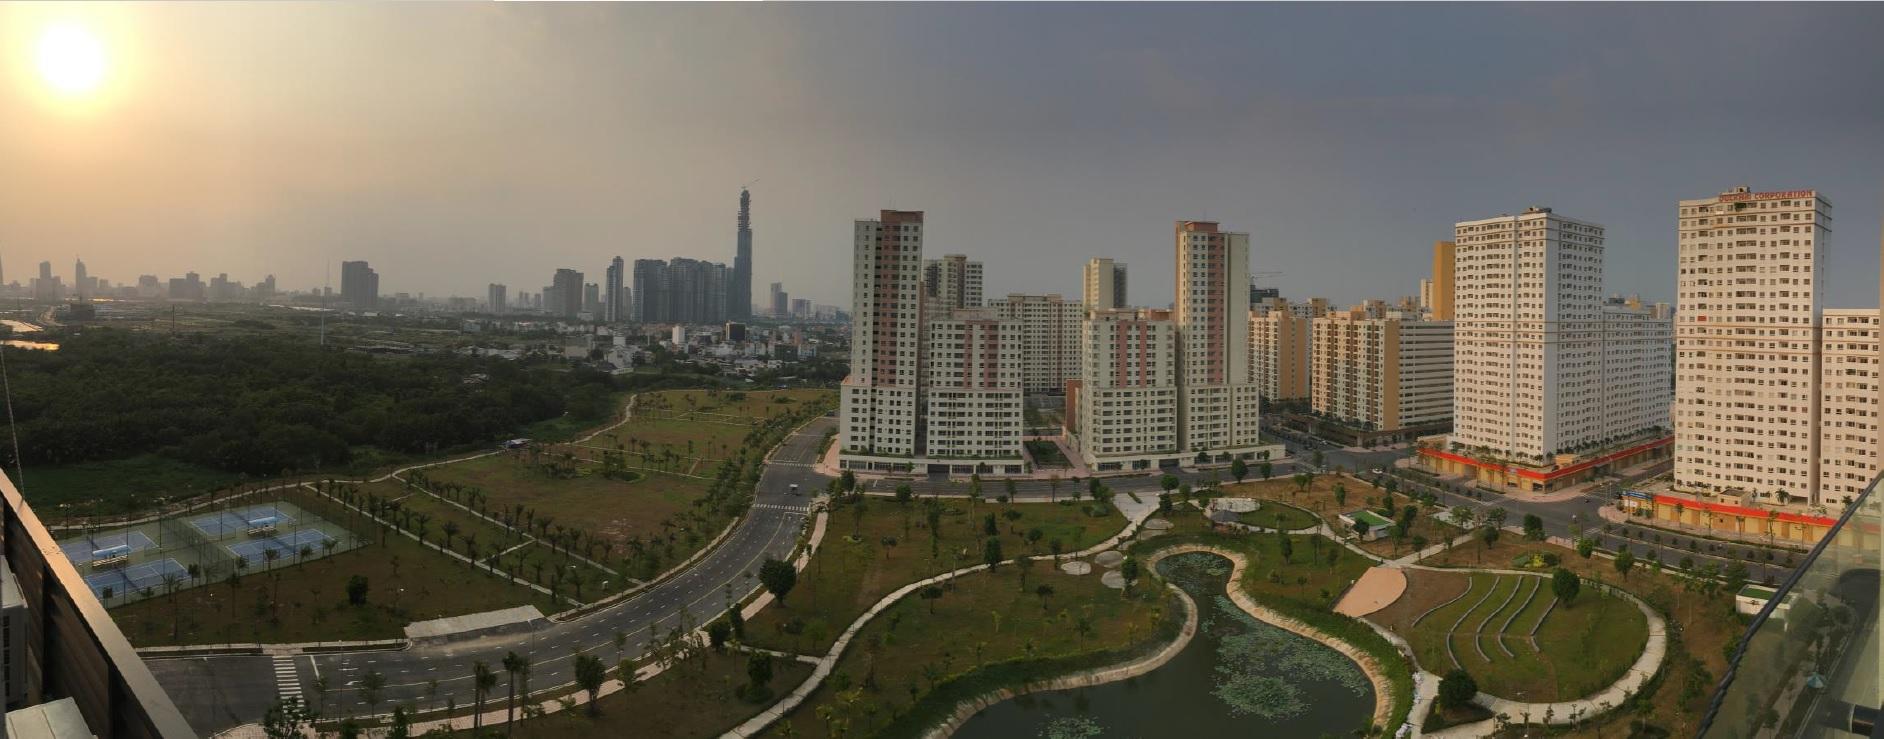 New City Ho Chi Minh park view